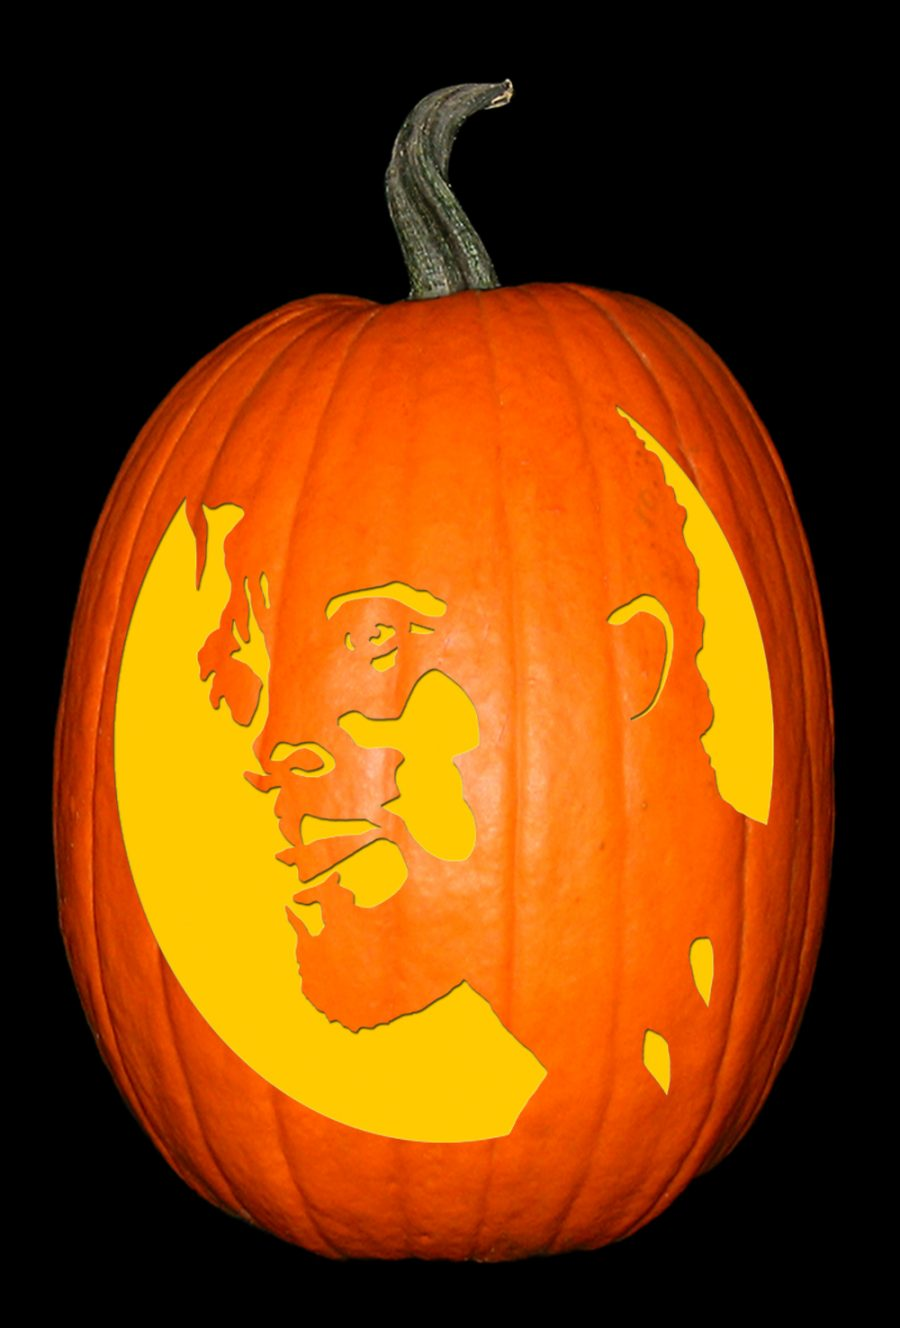 Black Panther - Chadwick Boseman Pumpkin